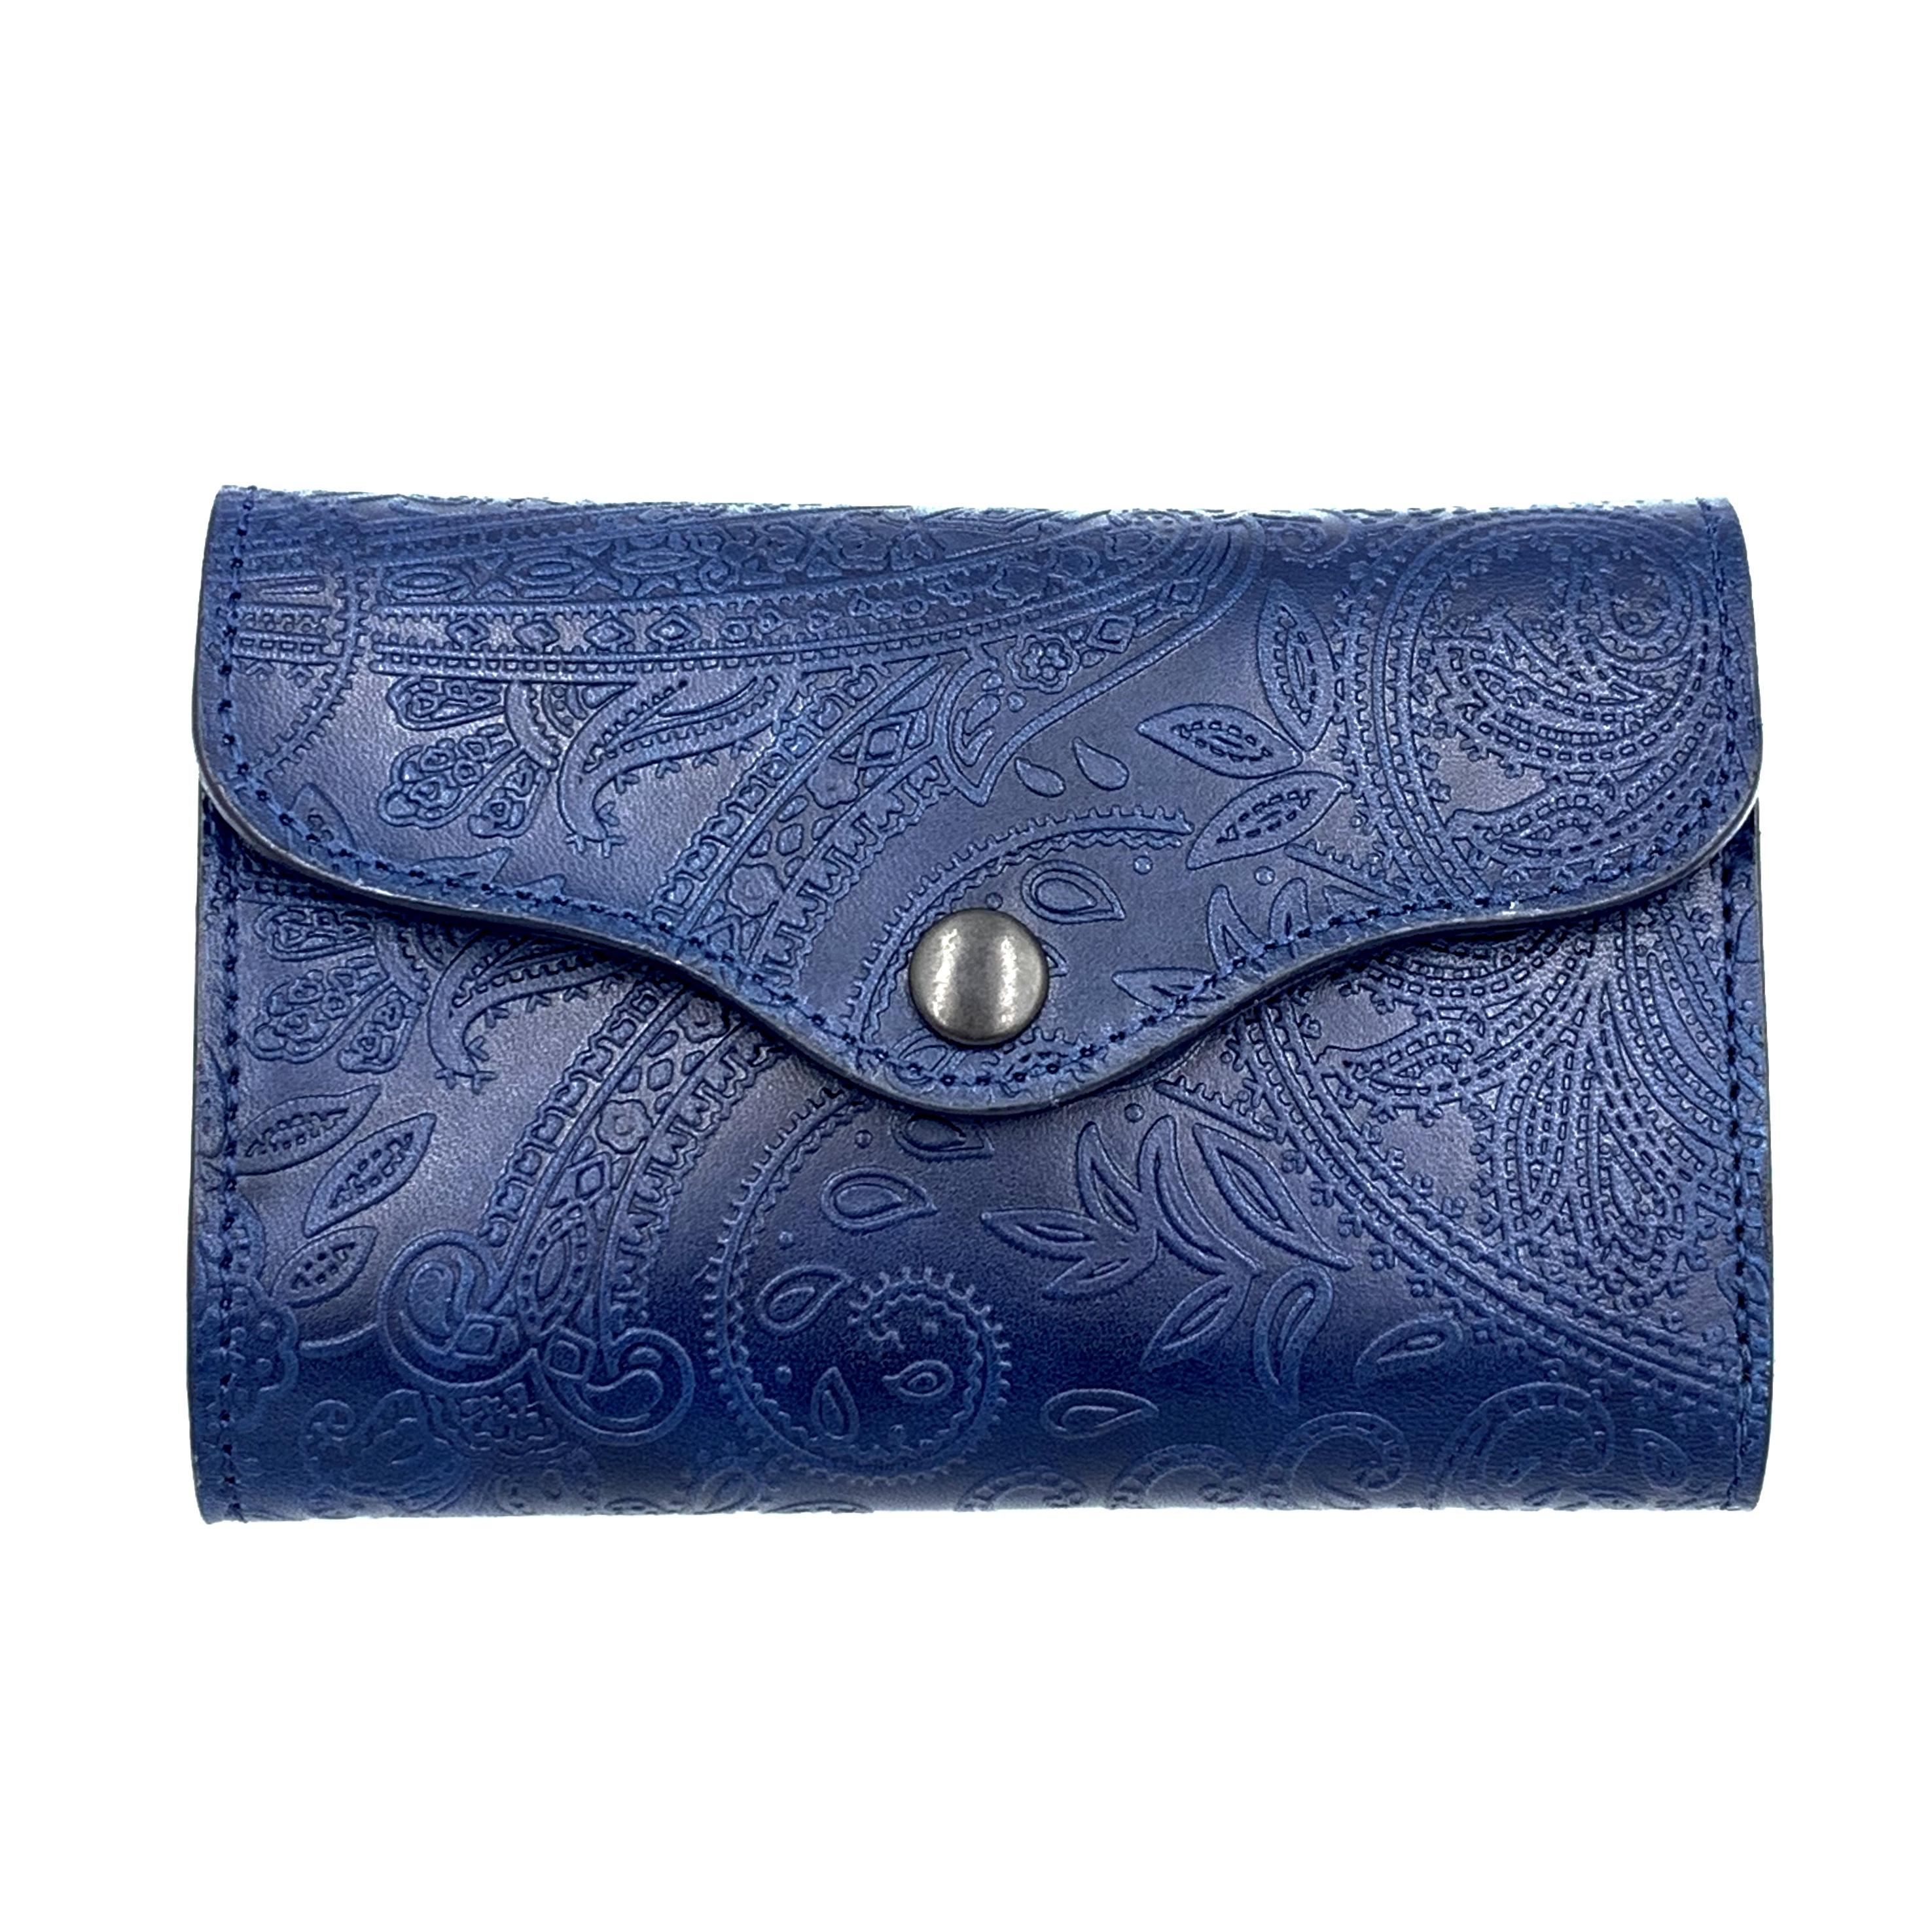 YONZY 三つ折りハーフ財布 ペイズリー革 ROYAL BLUE